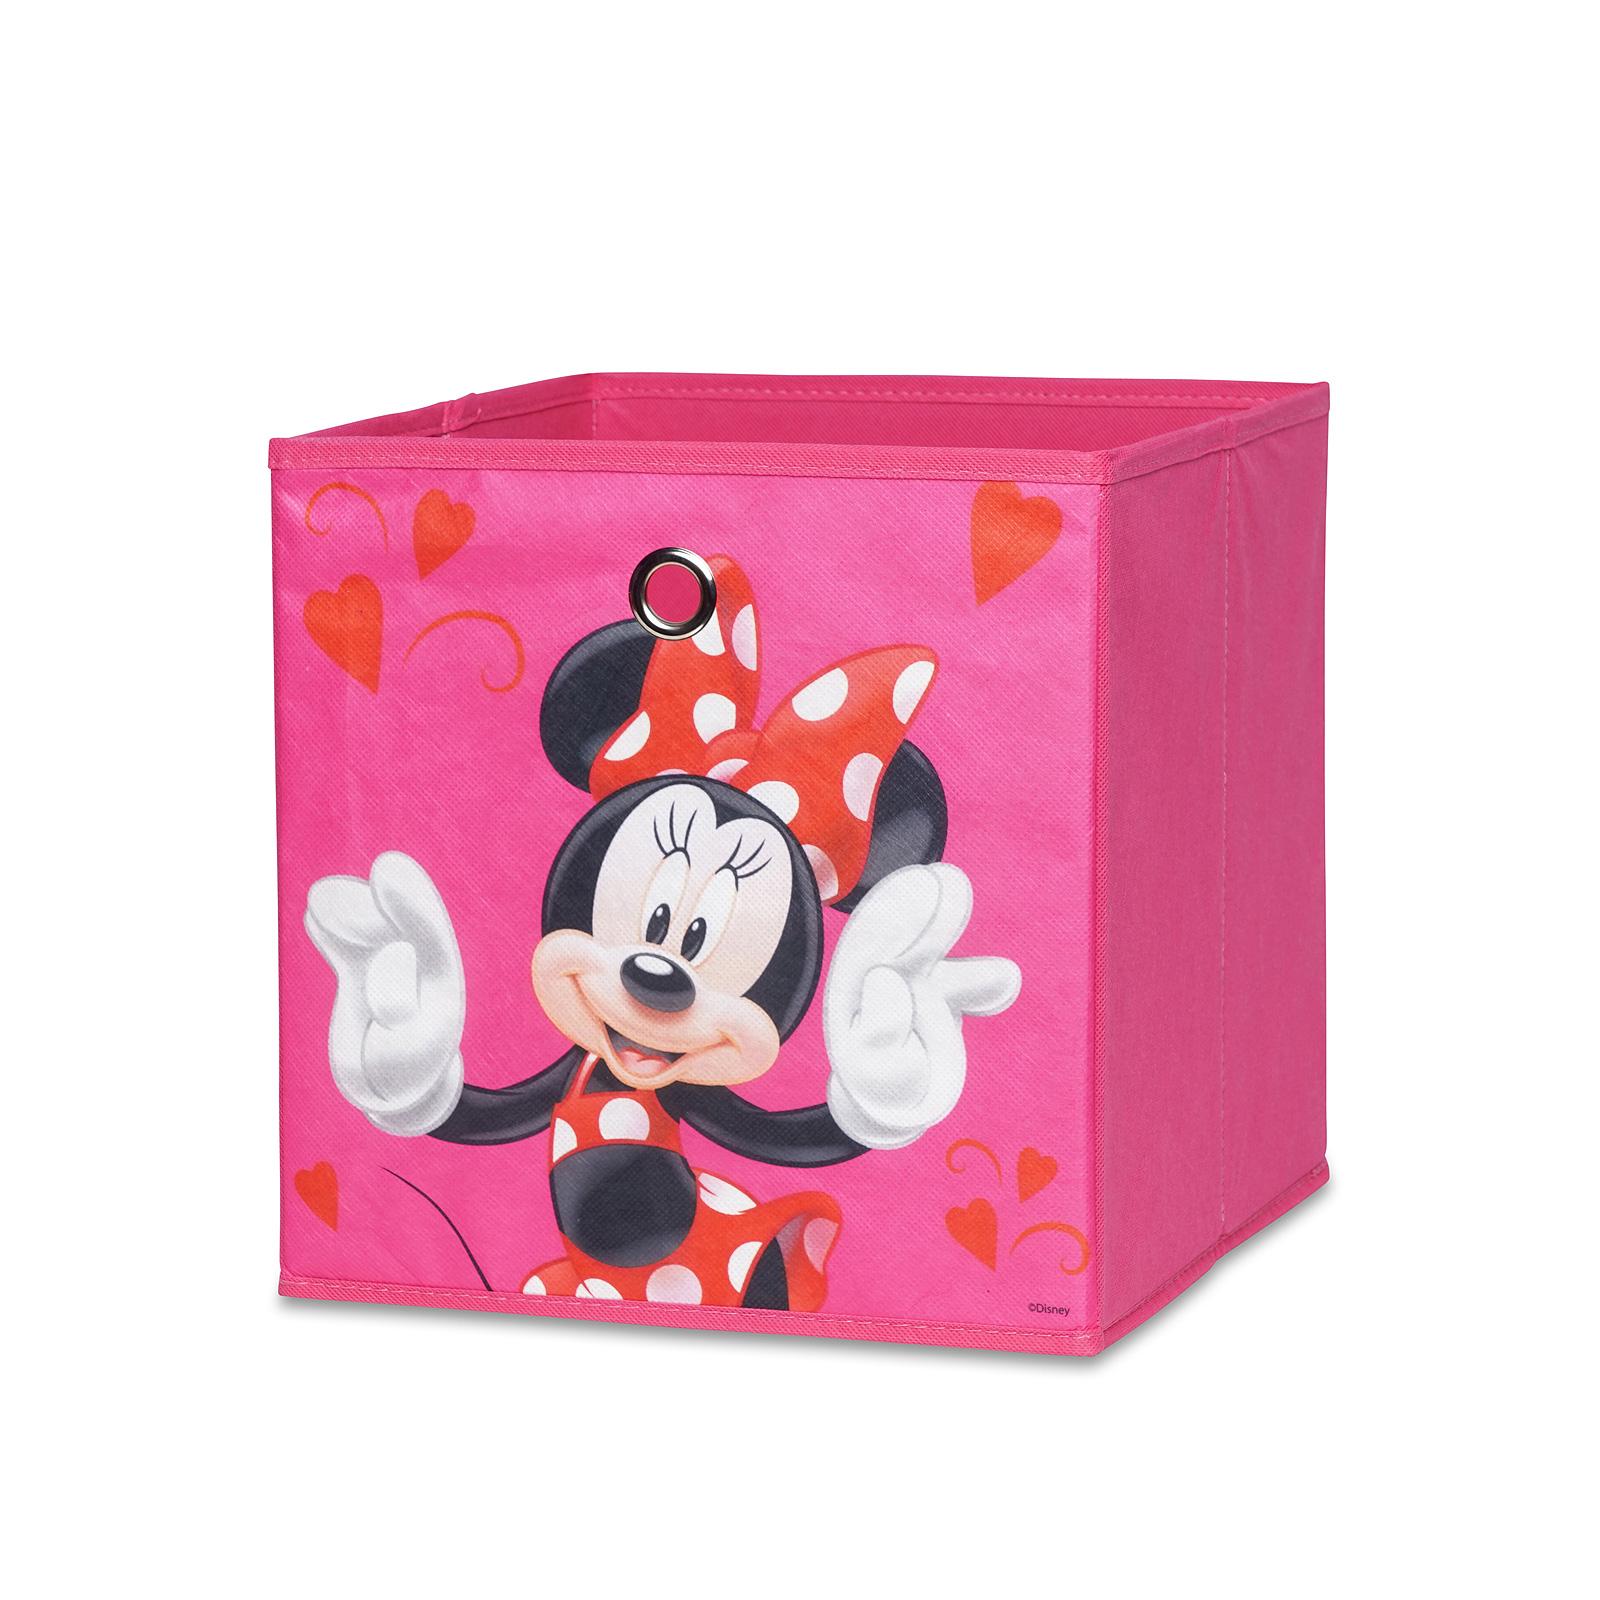 faltbox flori 1 faltkiste aufbewahrungsbox korb regal motiv auswahl 32x32x32 cm ebay. Black Bedroom Furniture Sets. Home Design Ideas